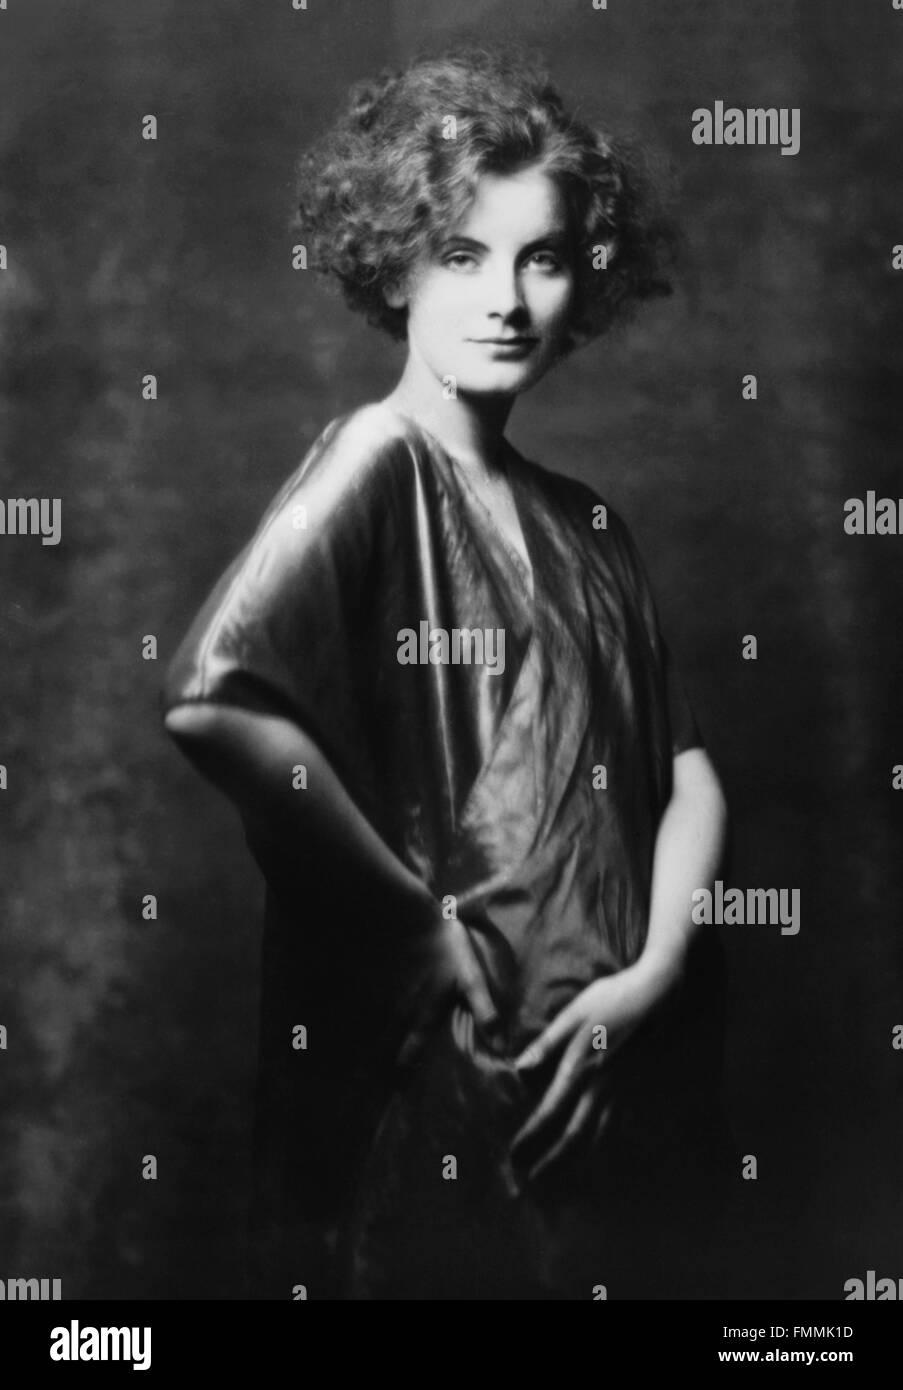 Greta garbo portrait of the swedish born film star greta for Garbo arredamenti